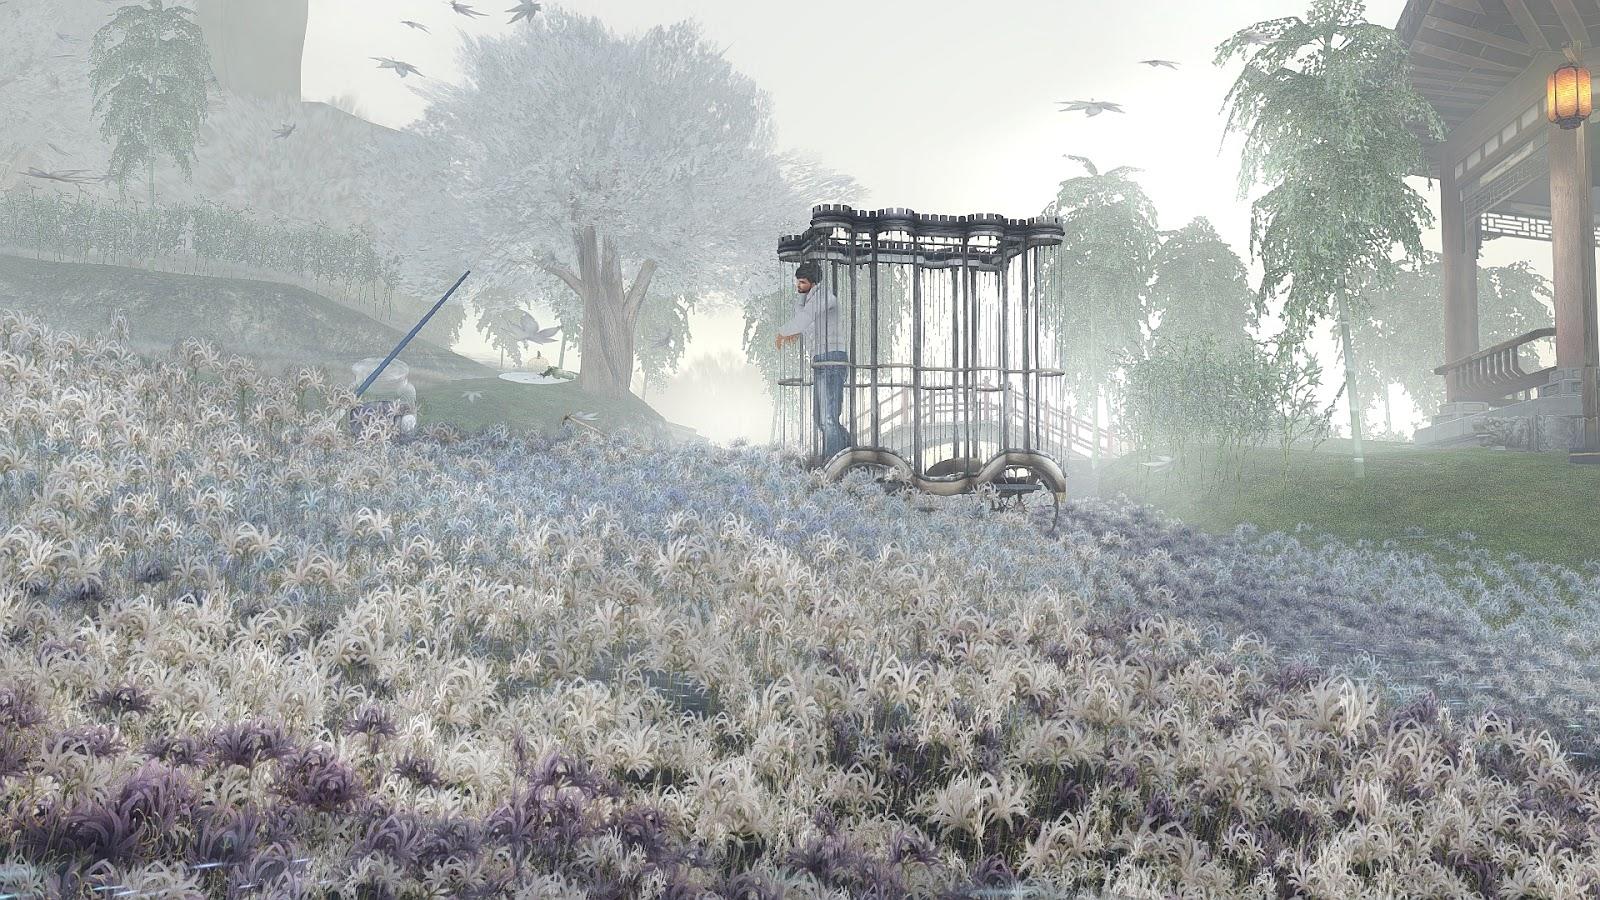 Echt virtuell the outer garden die tukireirou tour for Outer garden